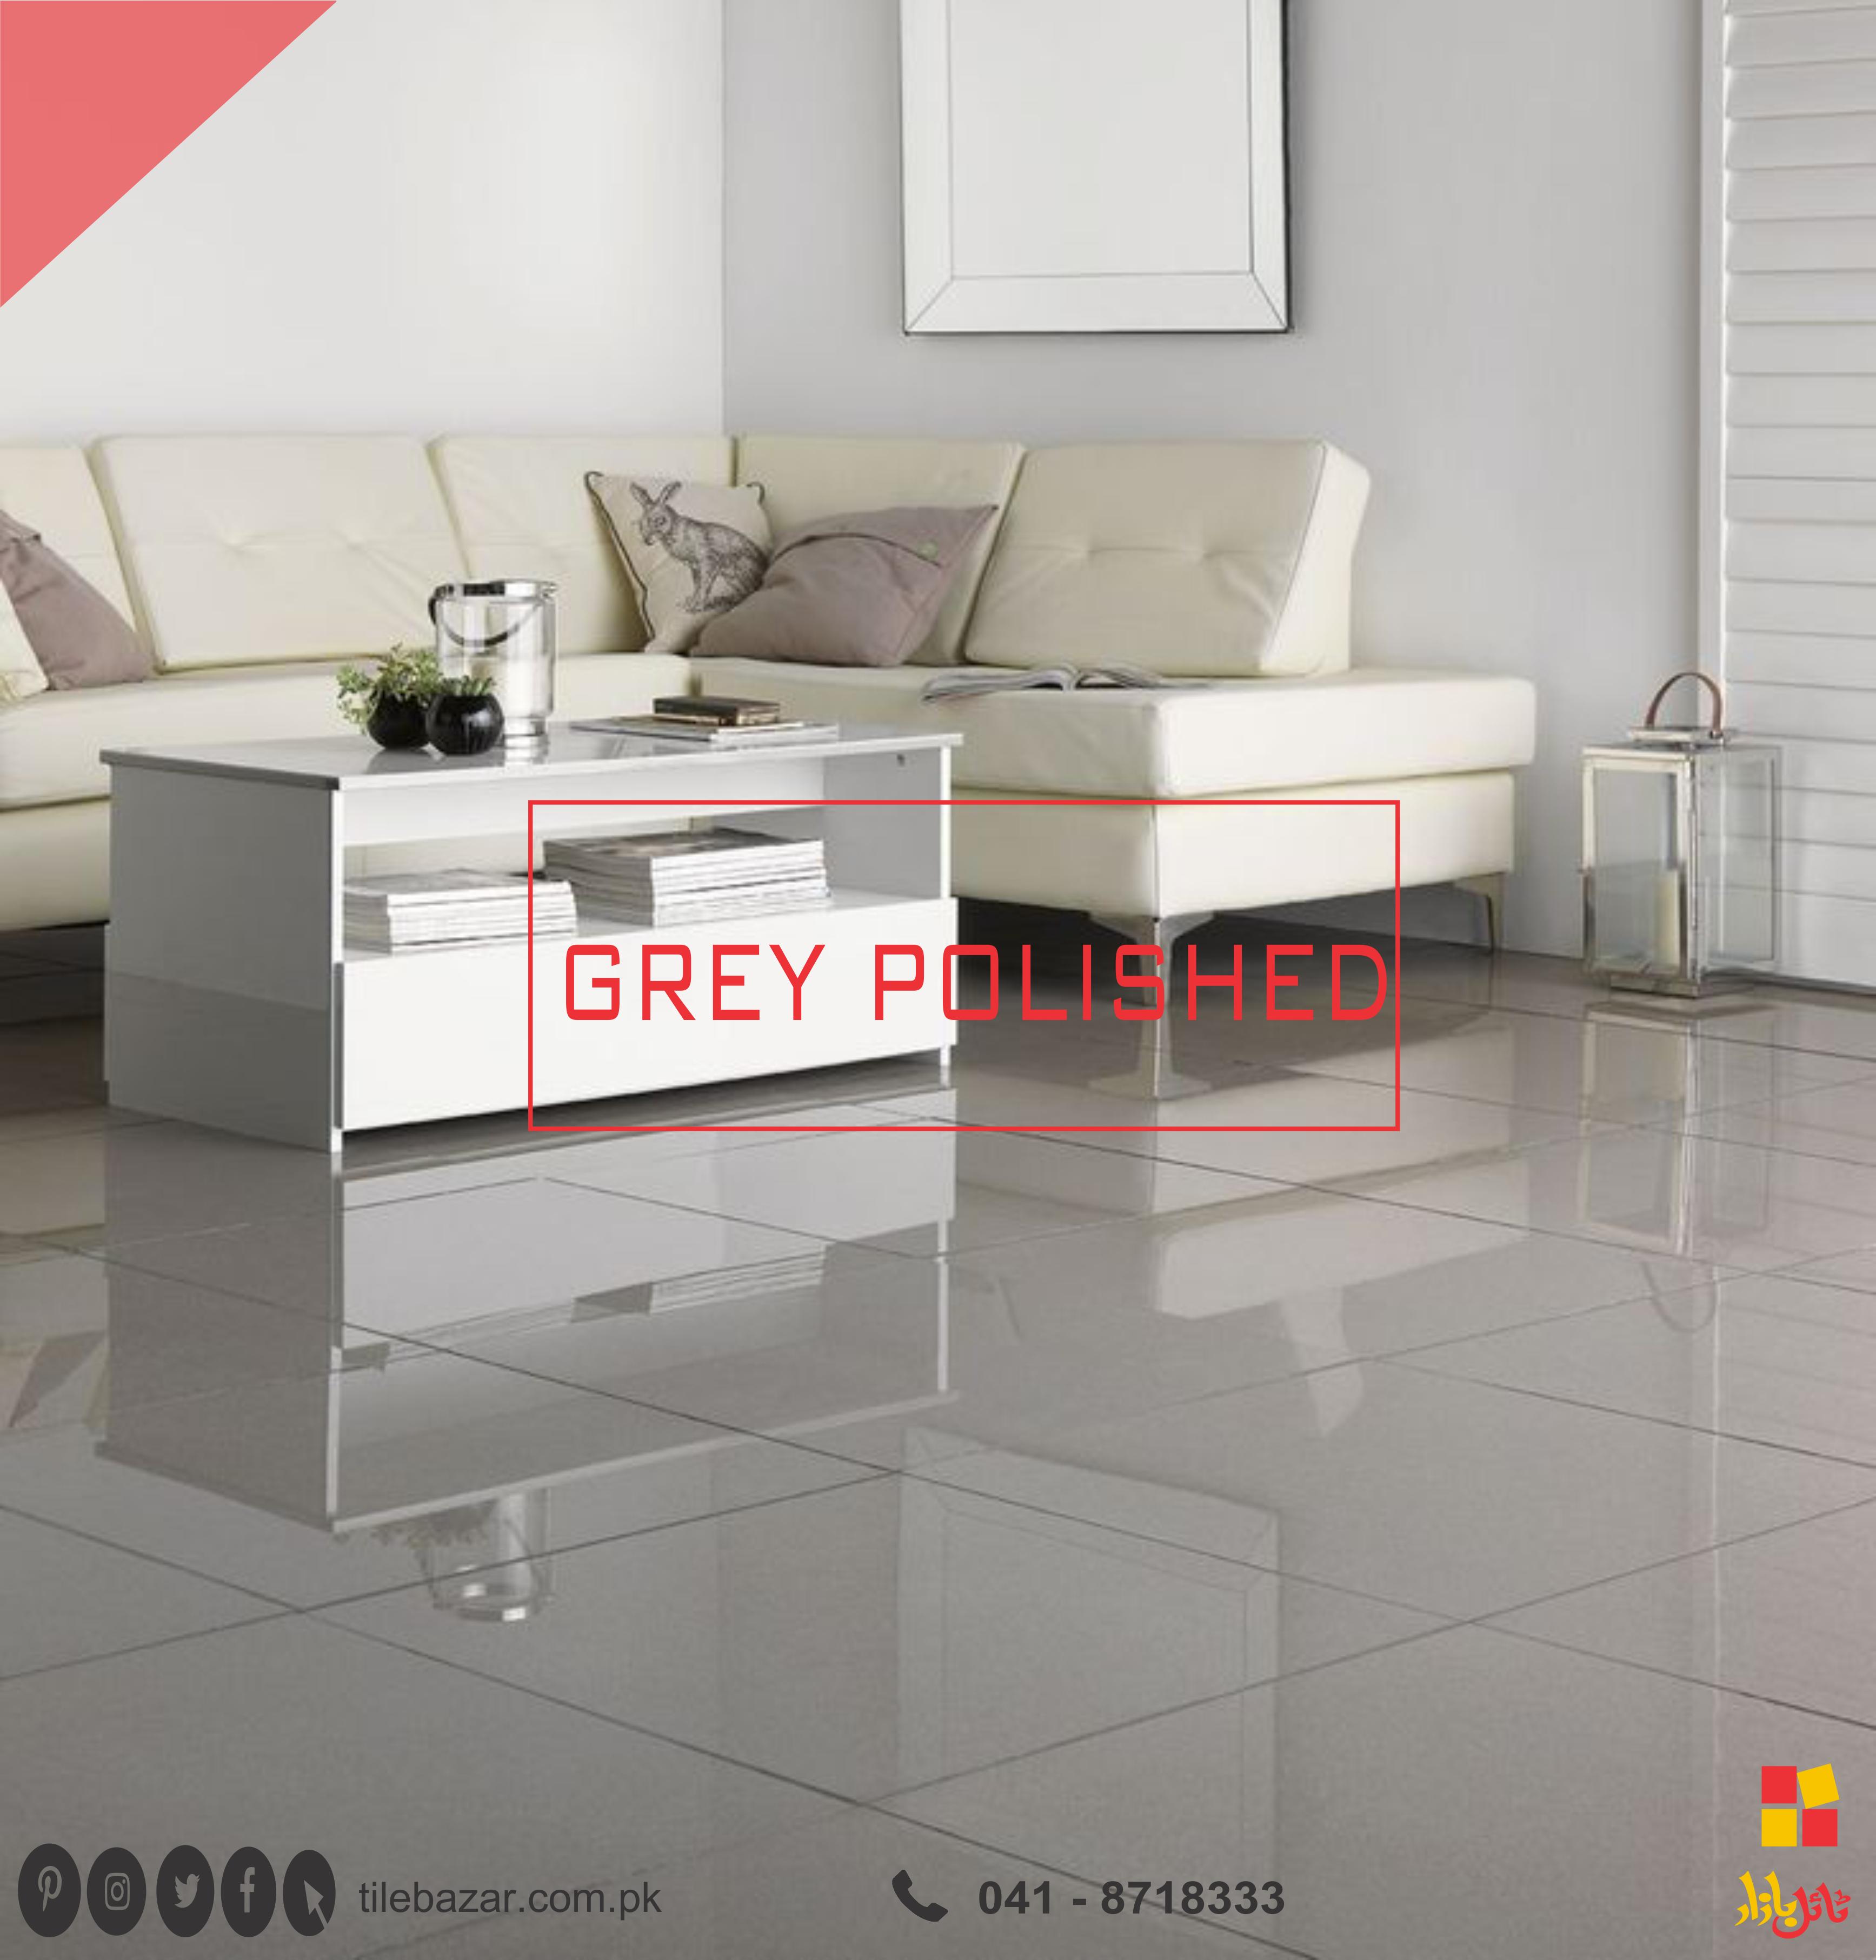 Grey Polished Porcelain Tiles For Your Livivg Room Visit Our Nearest Outlet For G Living Room Tiles Contemporary Home Office Furniture Tile Floor Living Room #porcelain #tiles #living #room